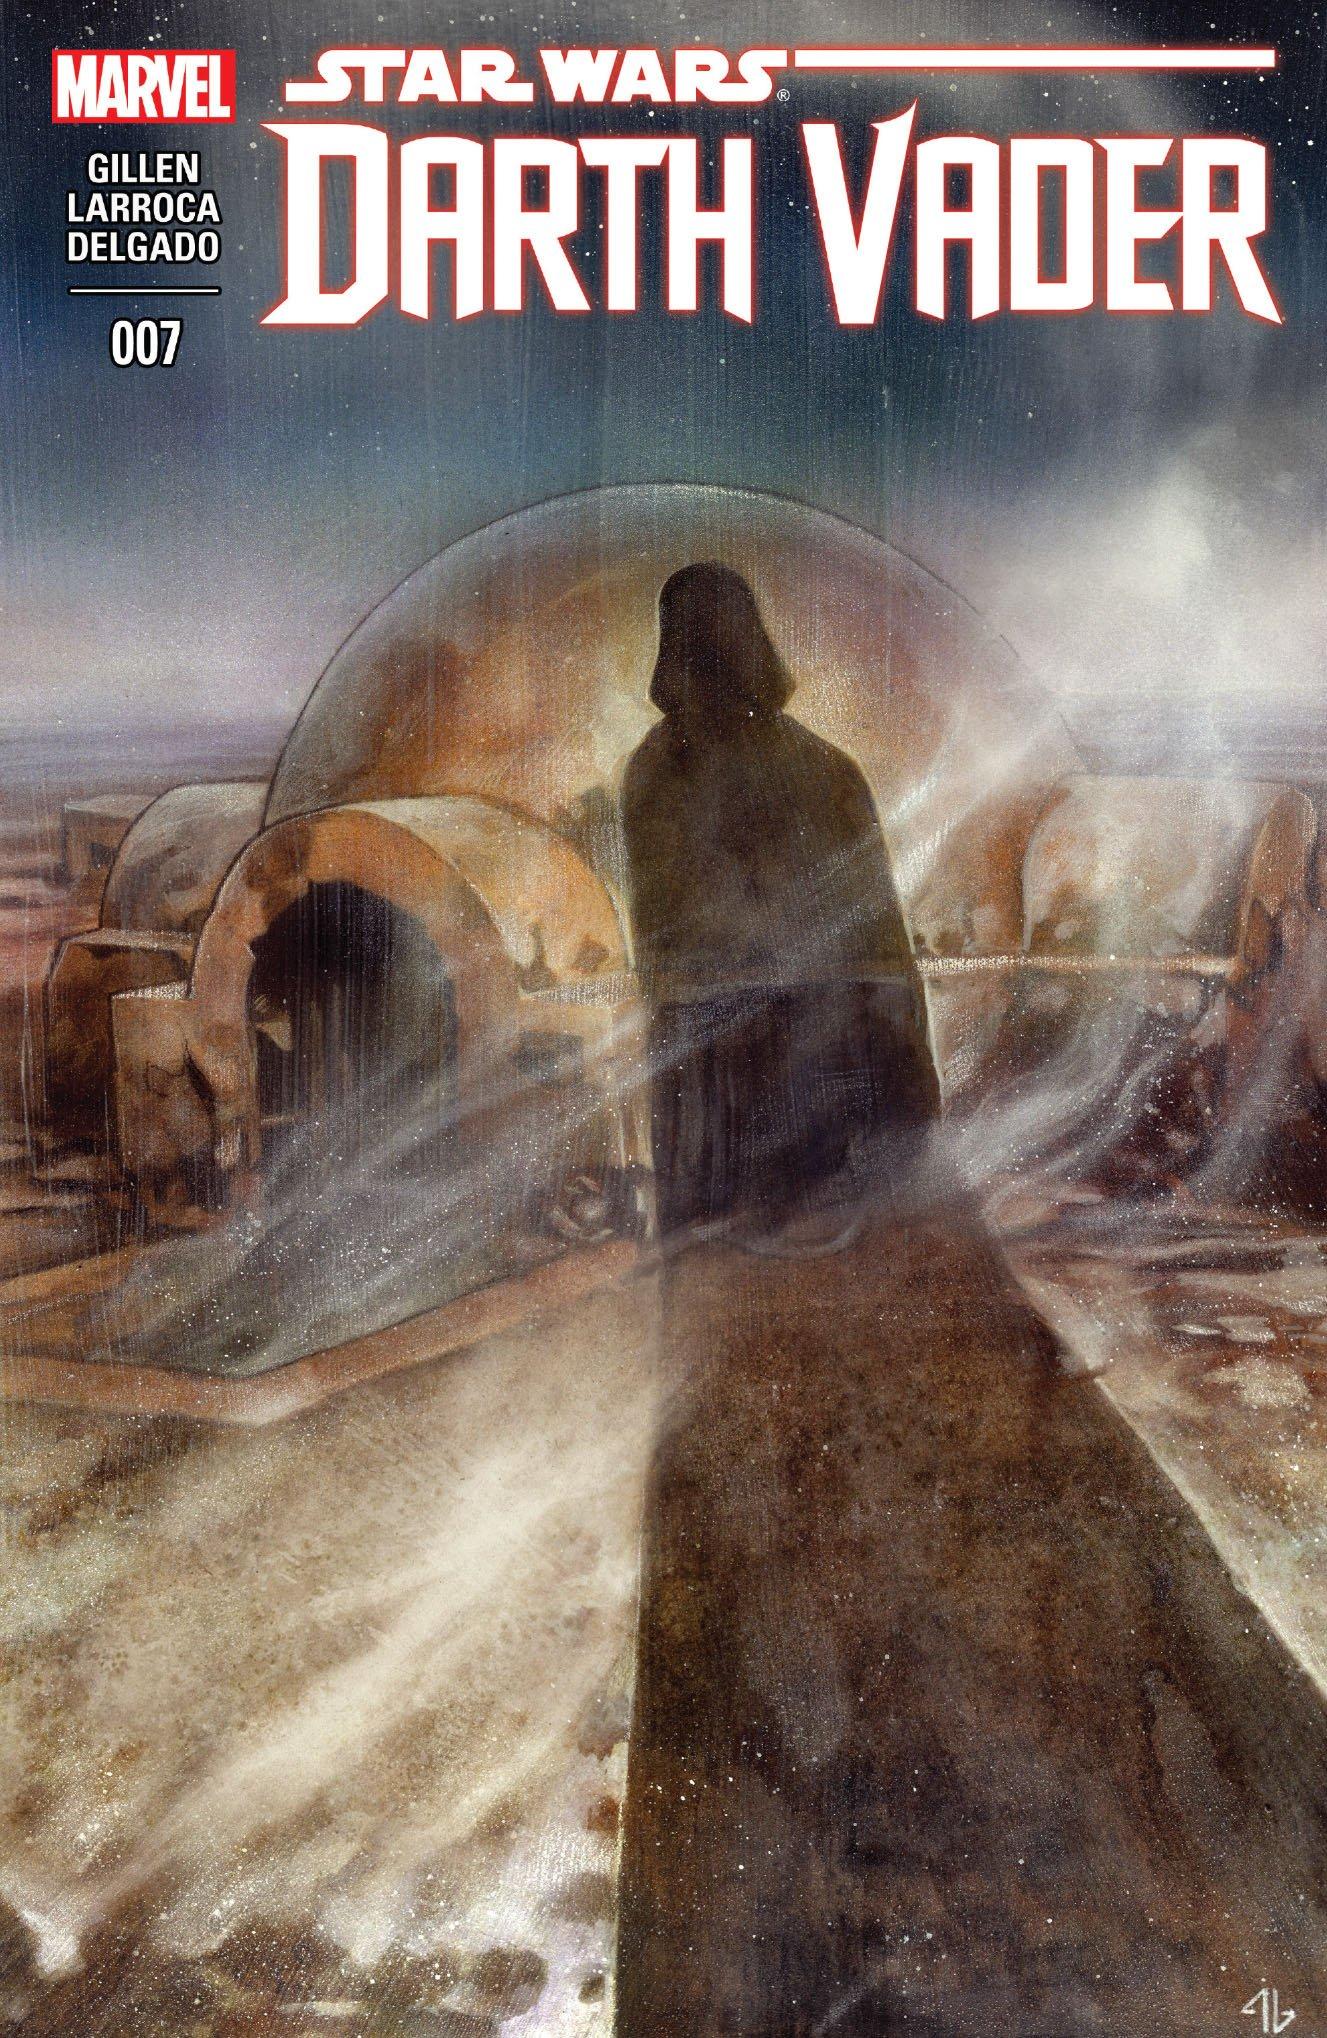 SW Darth Vader Cover 7